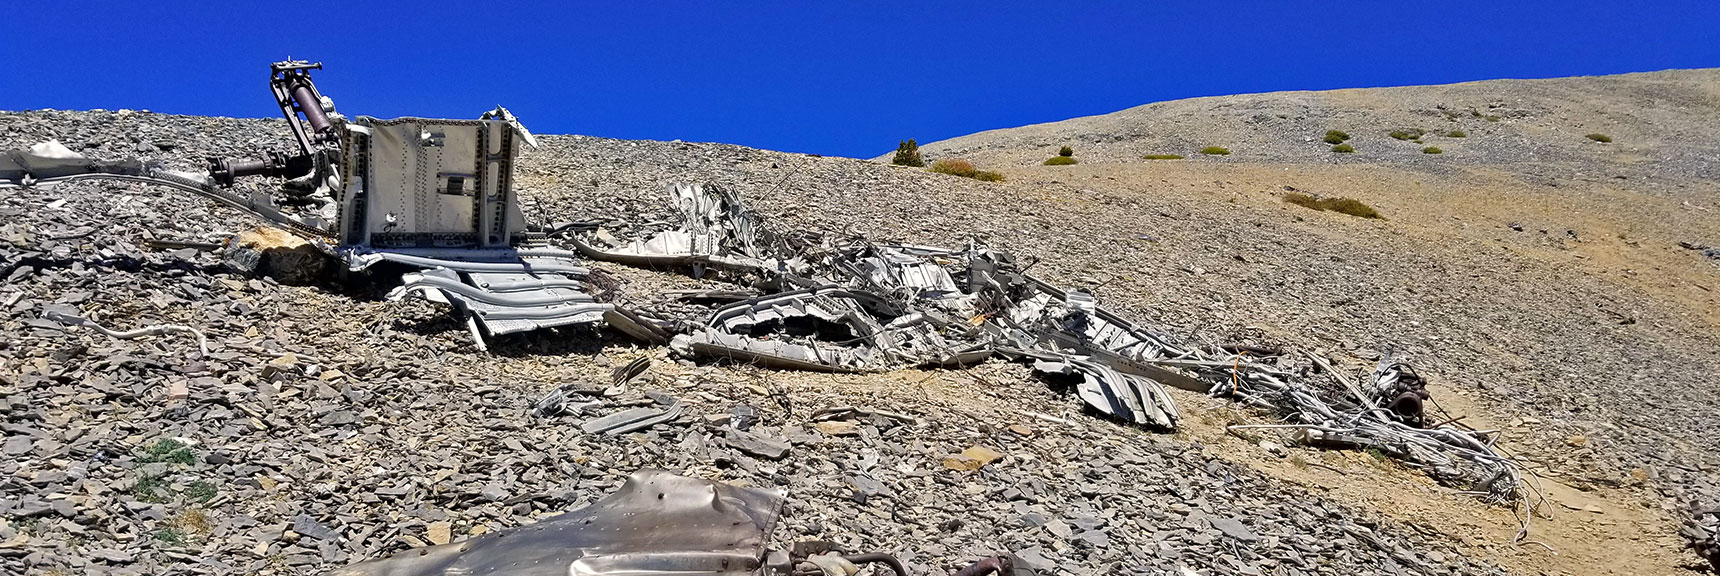 1955 C-54 Plane Wreckage Below Charleston Peak Summit | Griffith Peak & Charleston Peak Circuit Run, Spring Mountains, Nevada